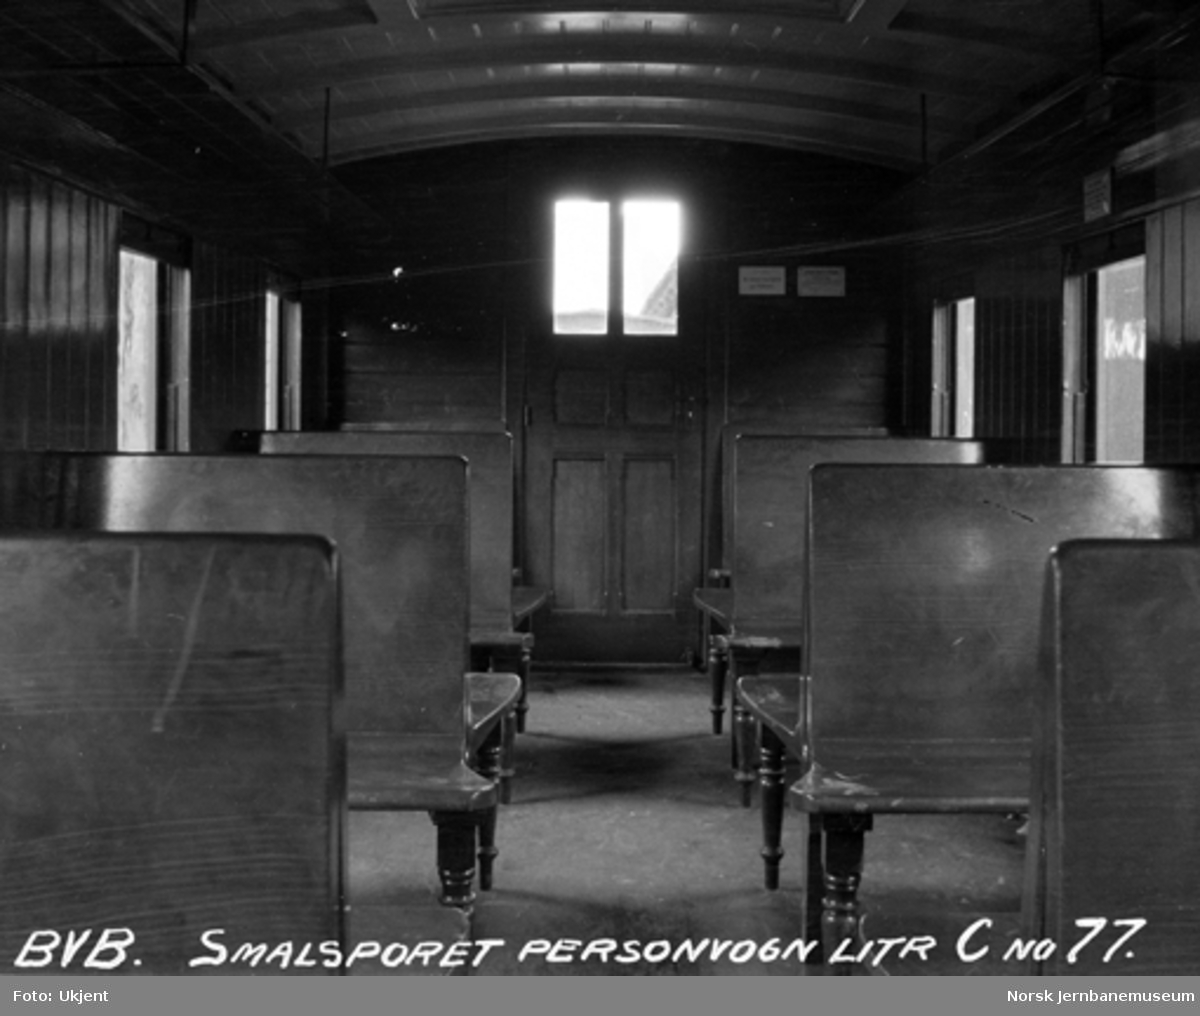 Interiørbilde fra Vossebanens smalsporede personvogn litra C nr. 77